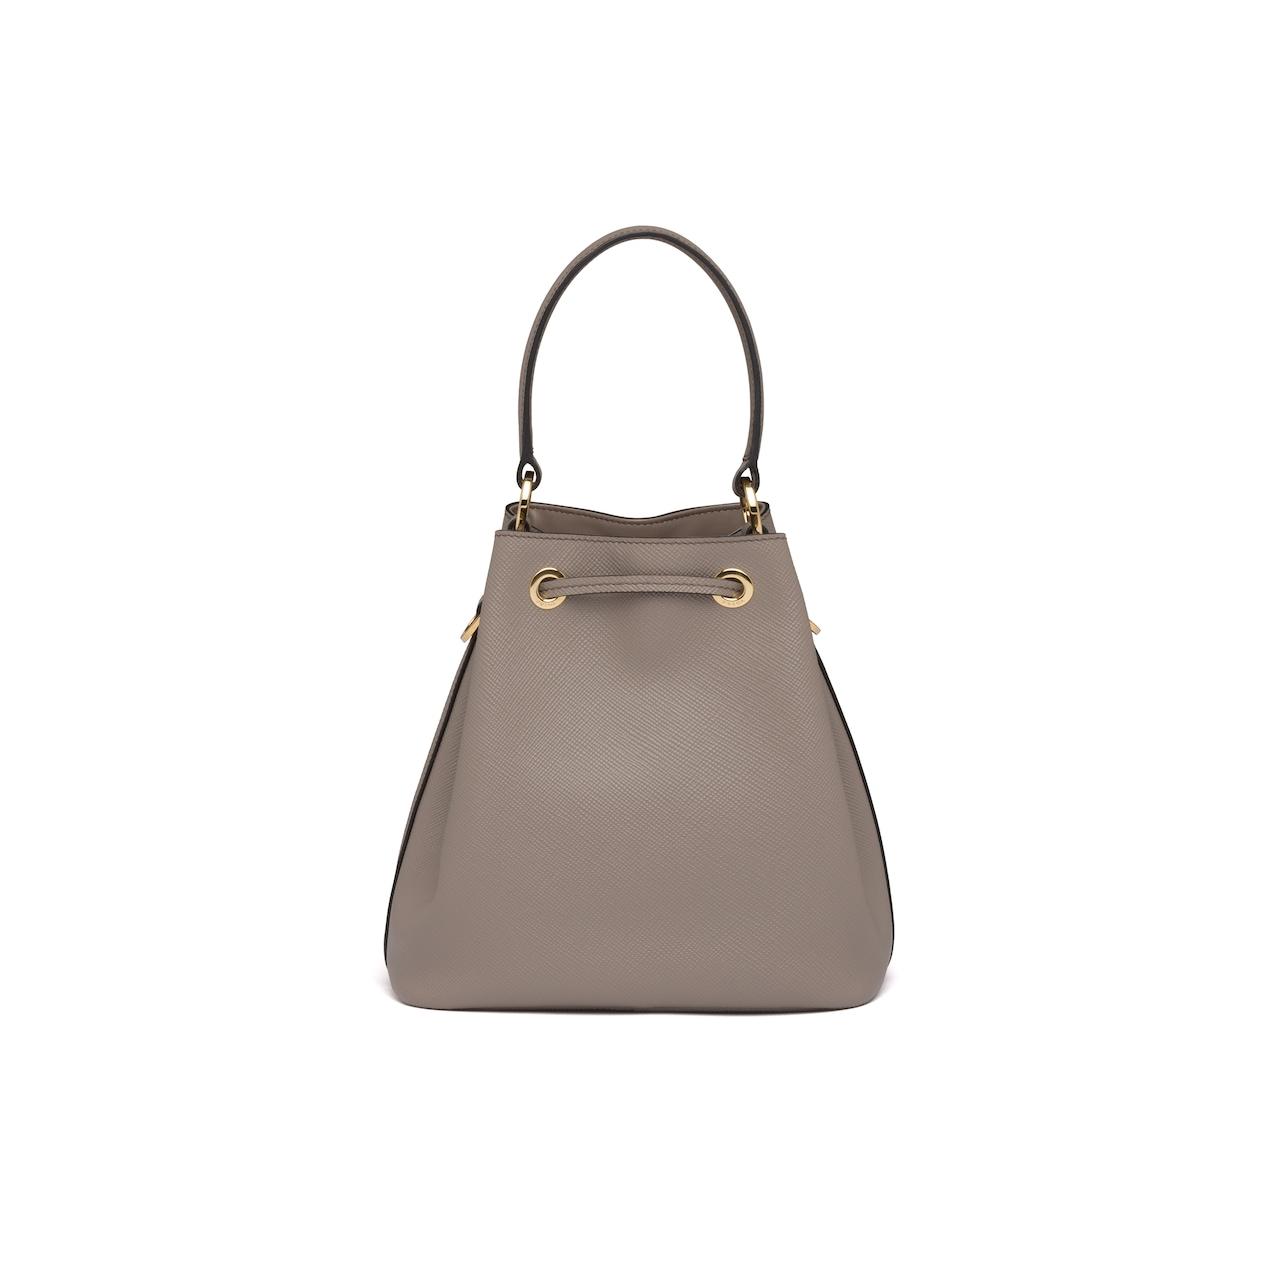 Saffiano leather bucket bag